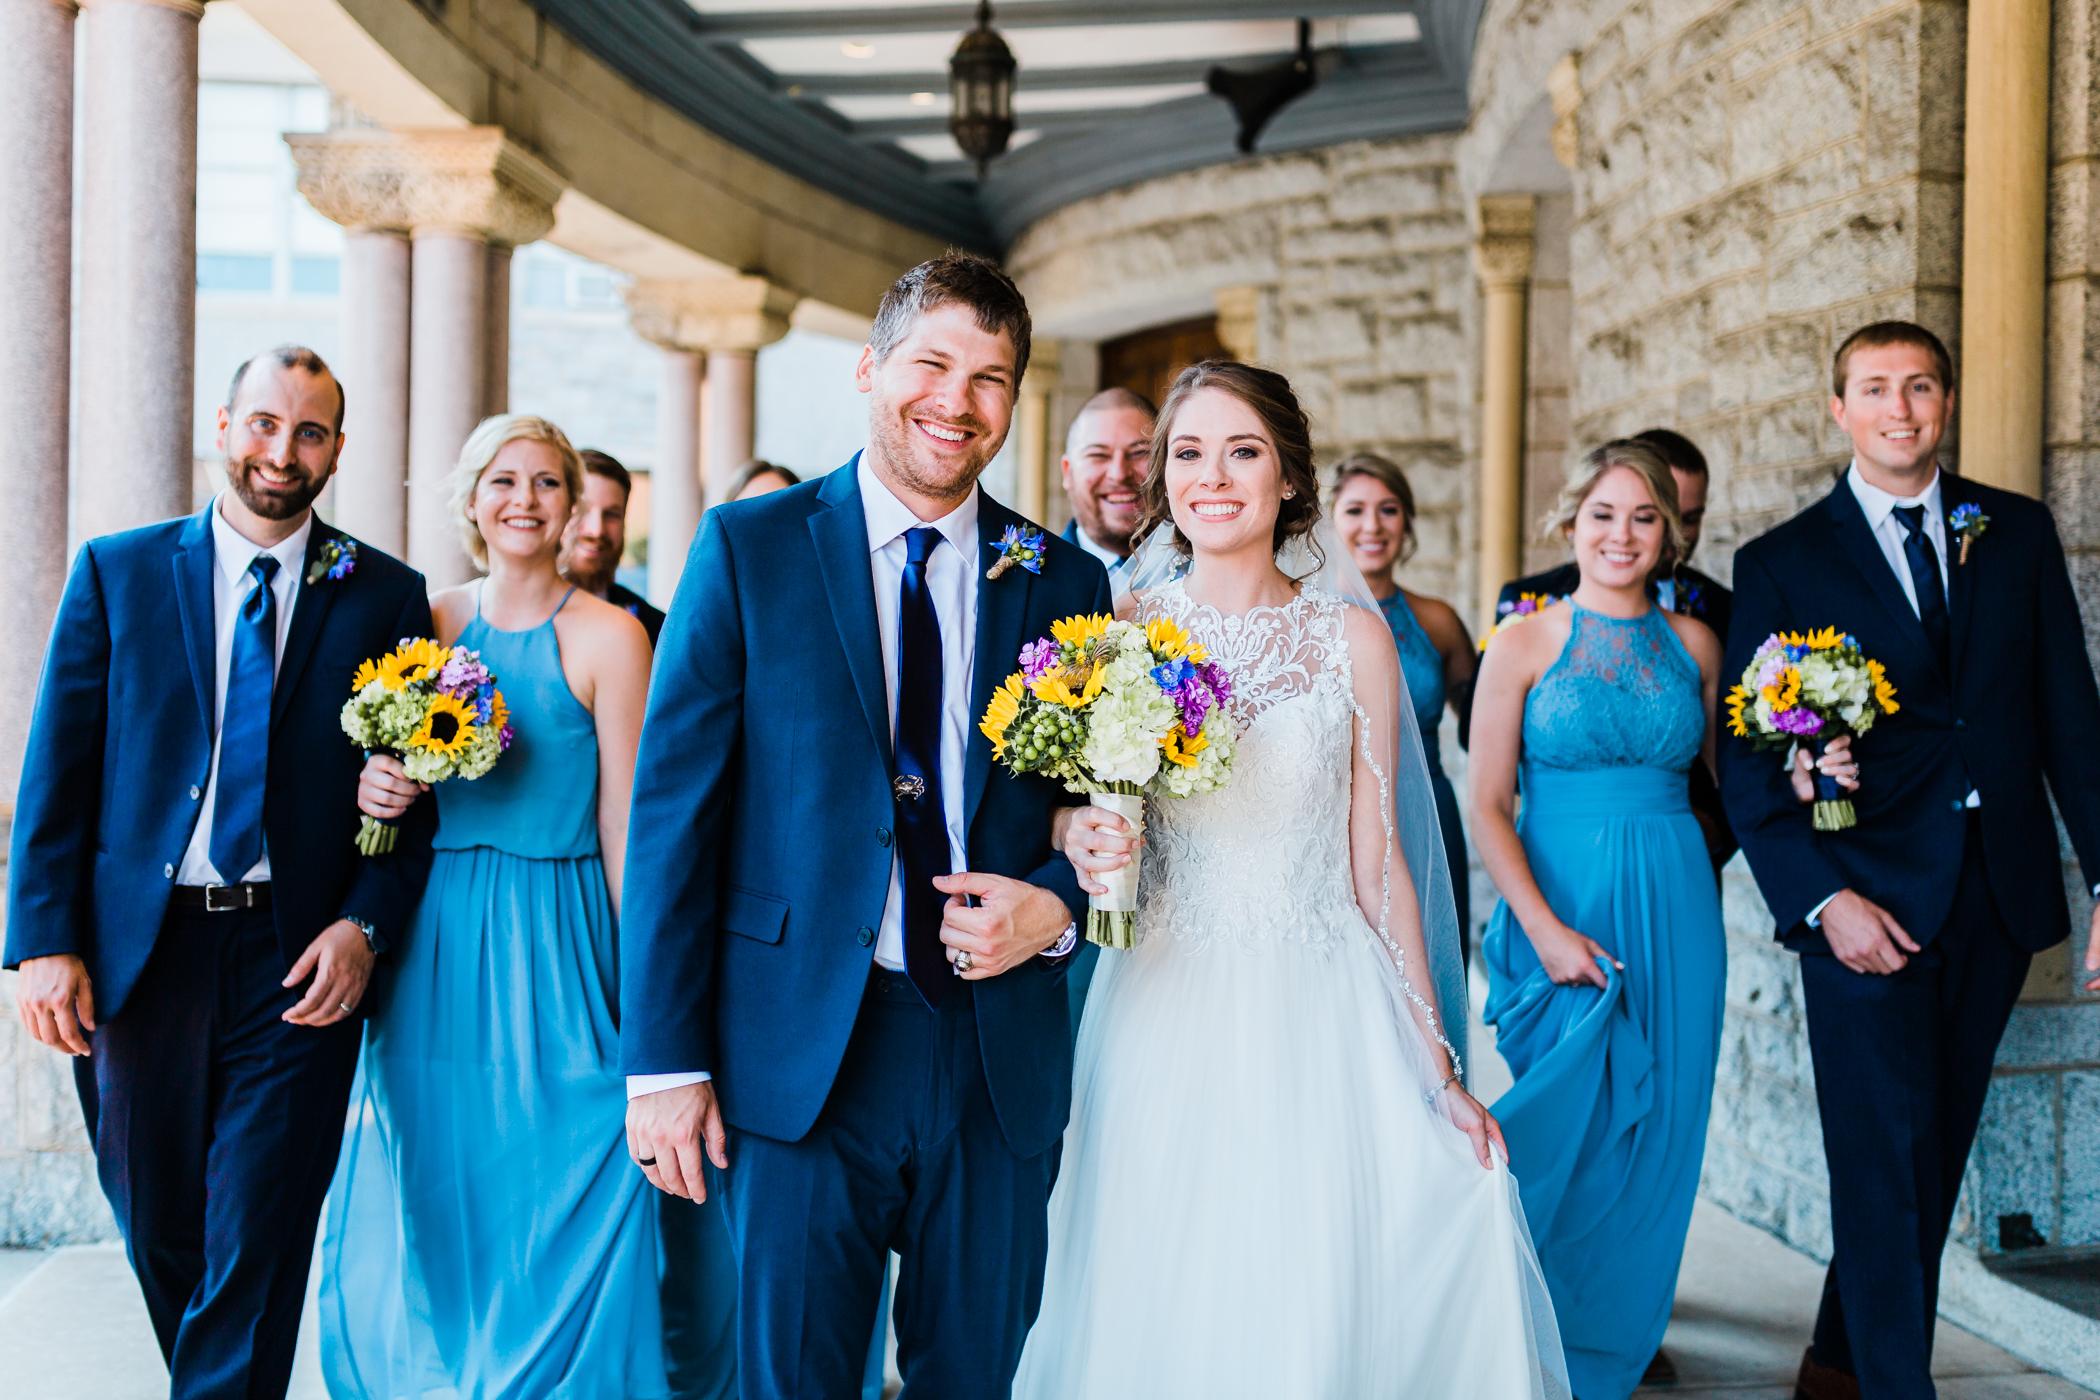 dusty blue bridesmaids dresses - sunflower bouquets - baltimore wedding photographer